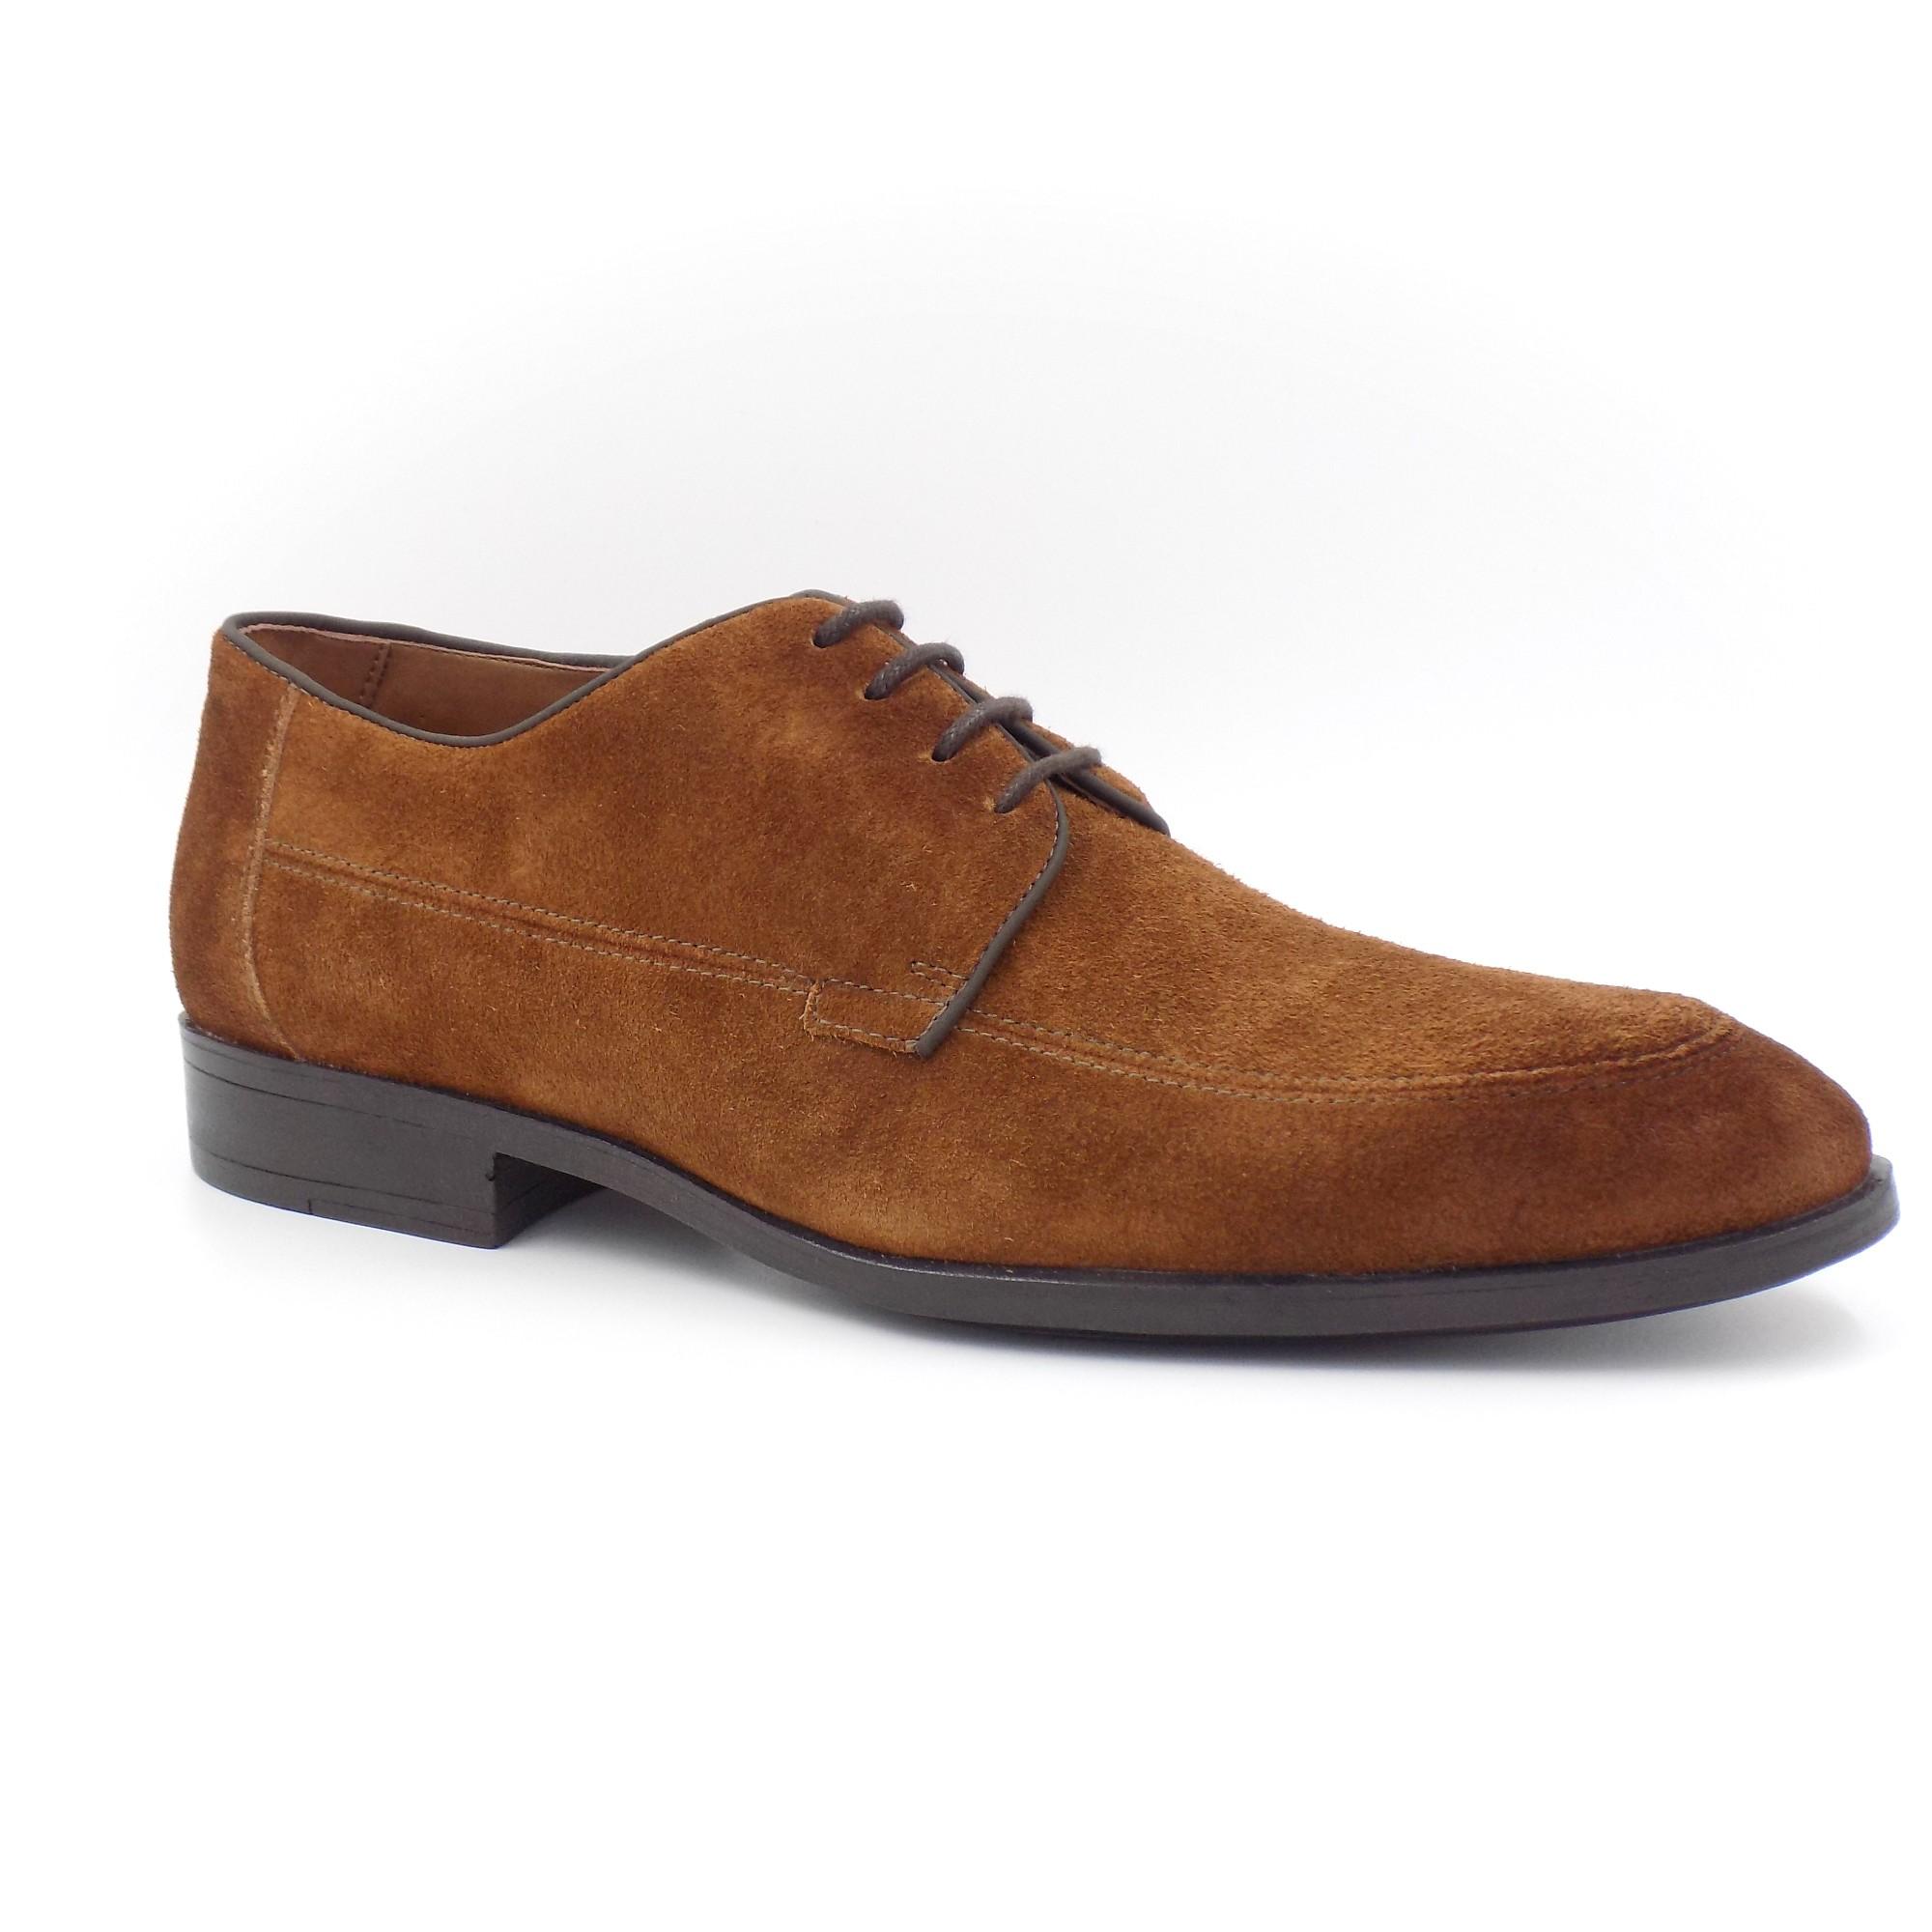 Sapato Casual Camurça Sola Borracha